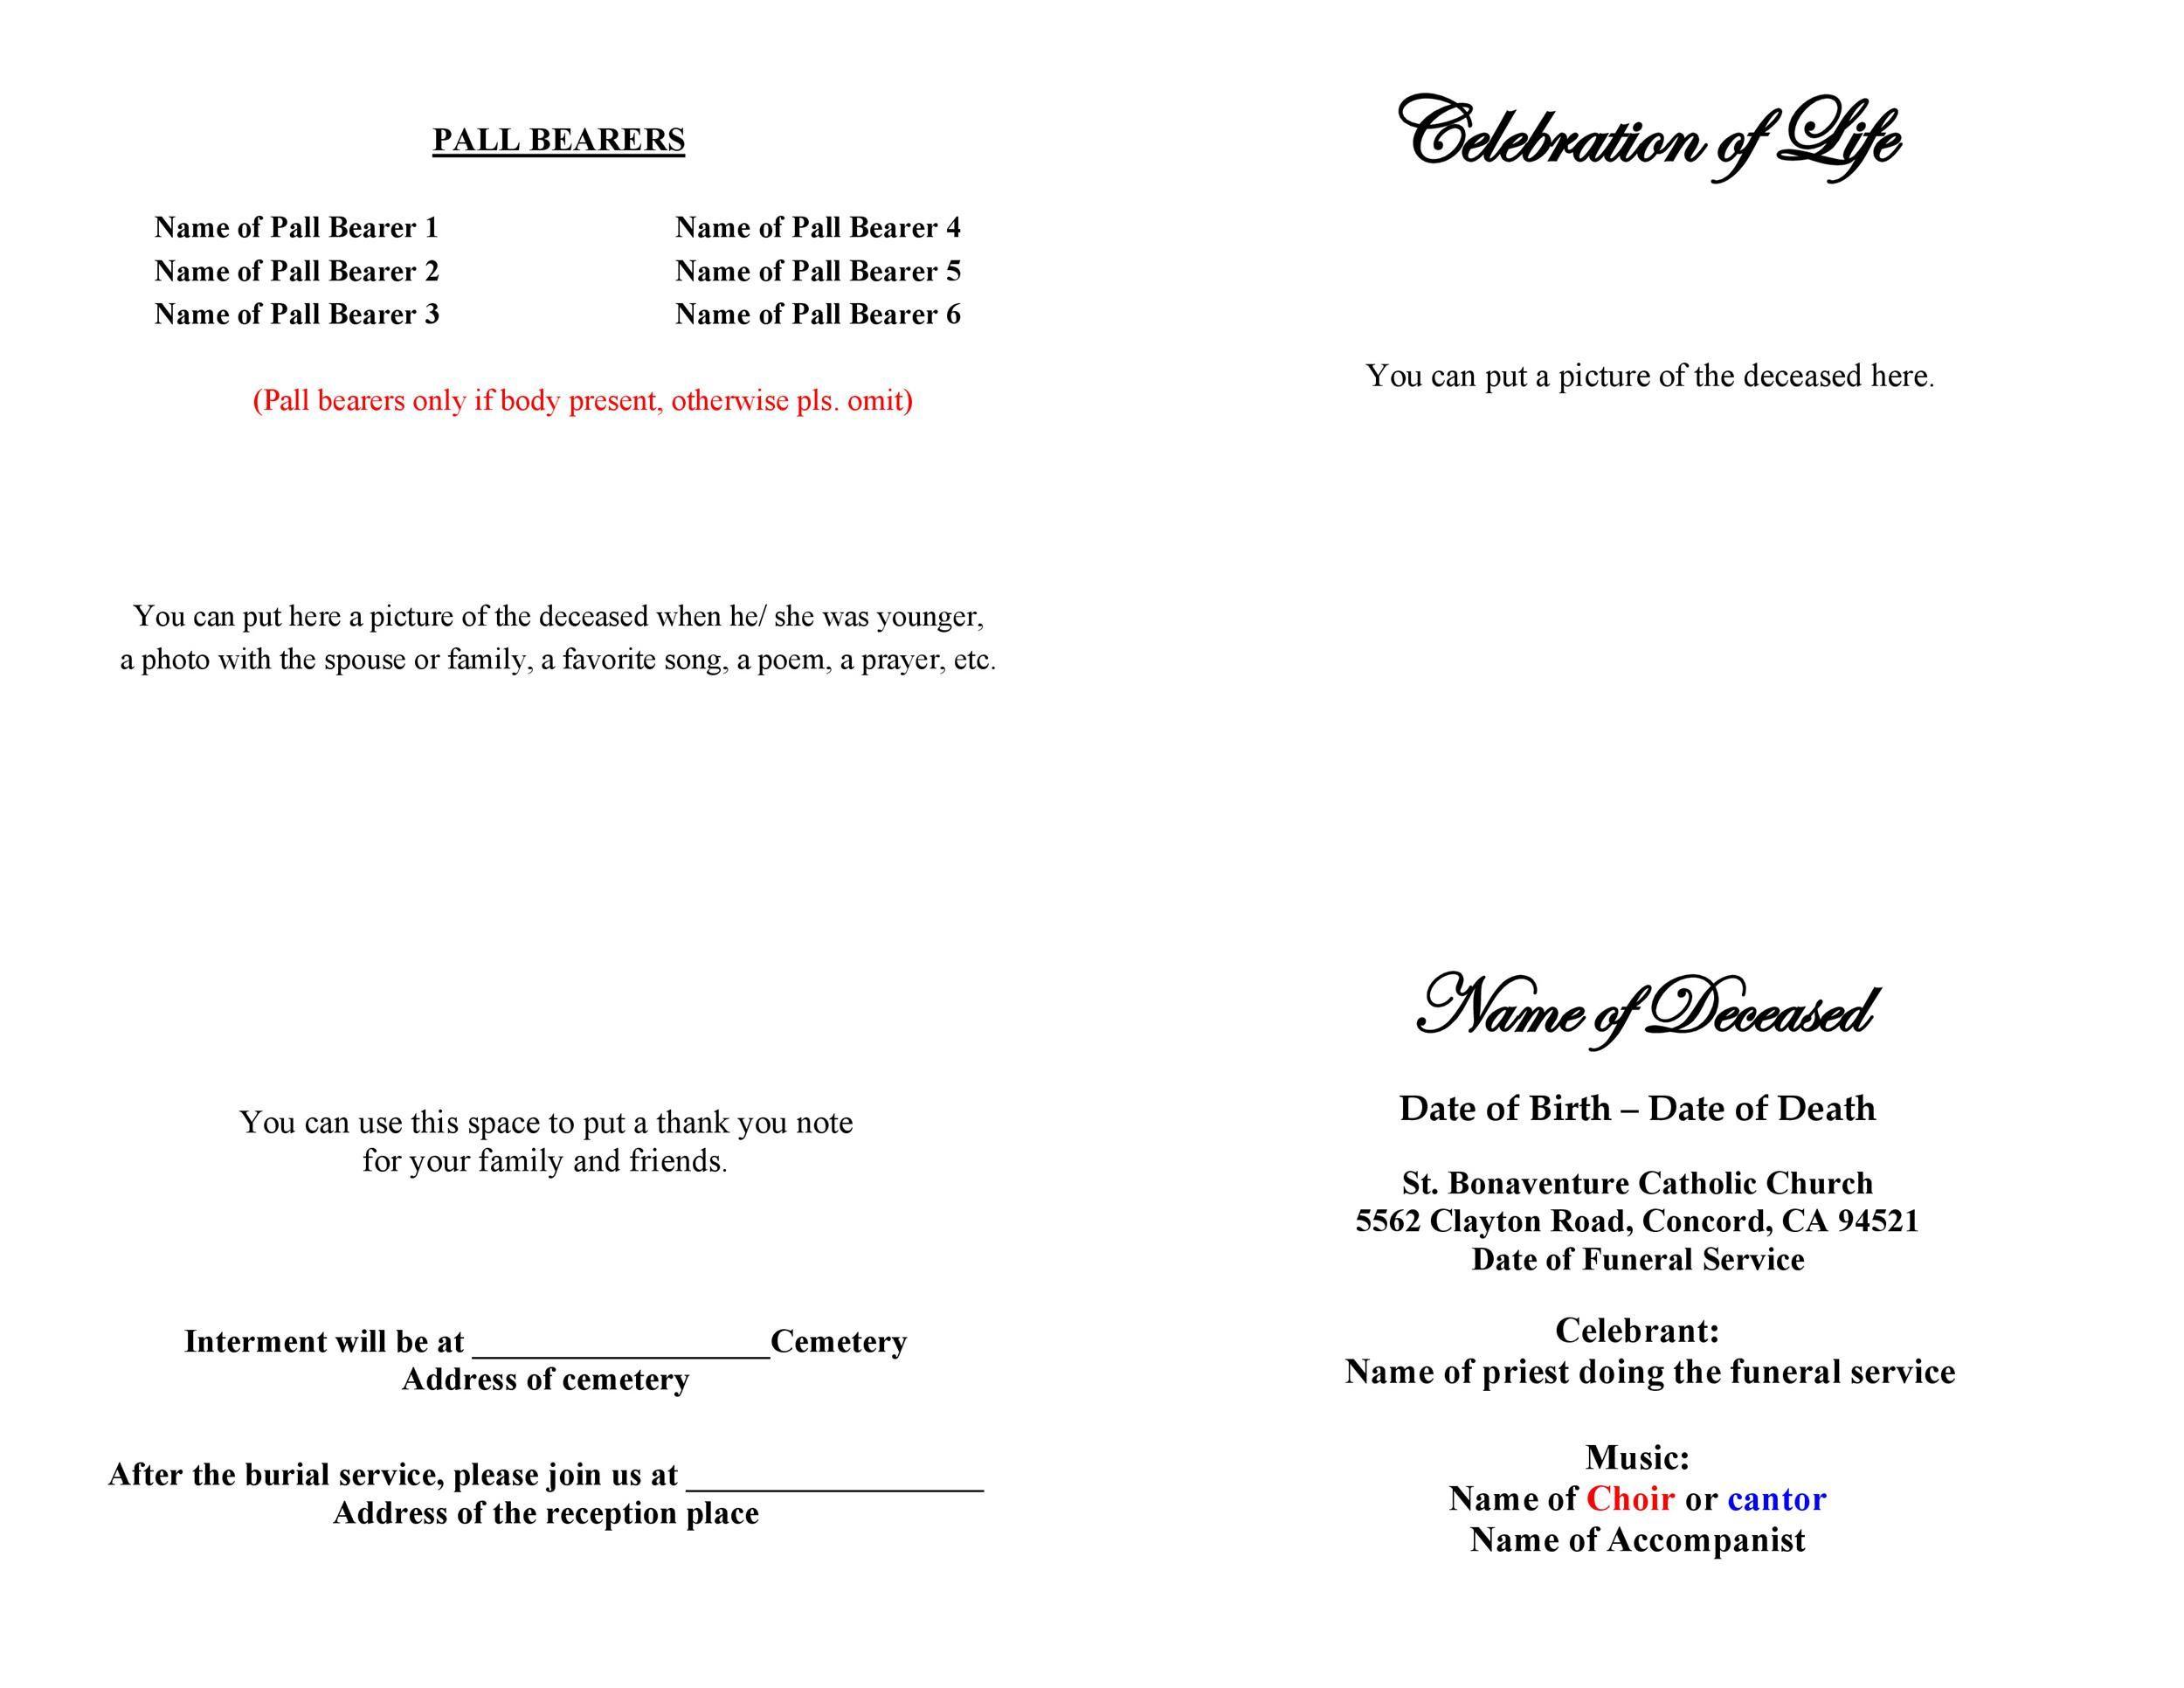 007 Rare Celebration Of Life Program Template Free Image  Editable WordFull